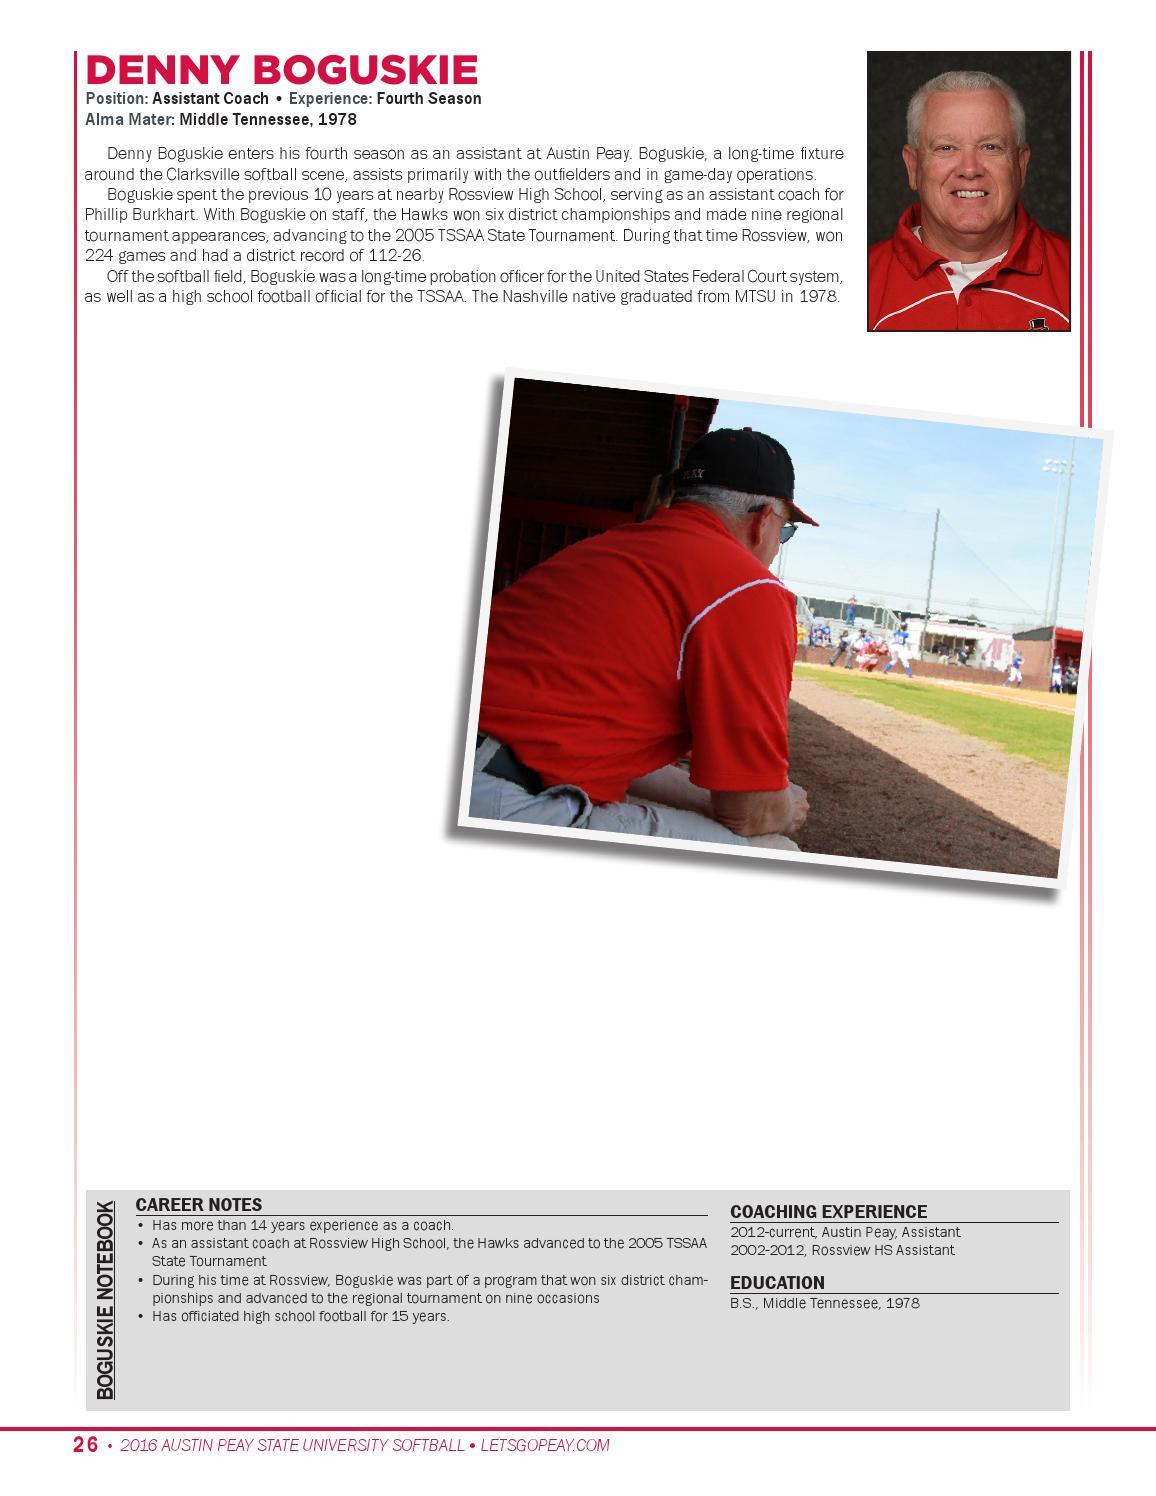 2016 Softball Media Guide by APSU Sports-Information - issuu